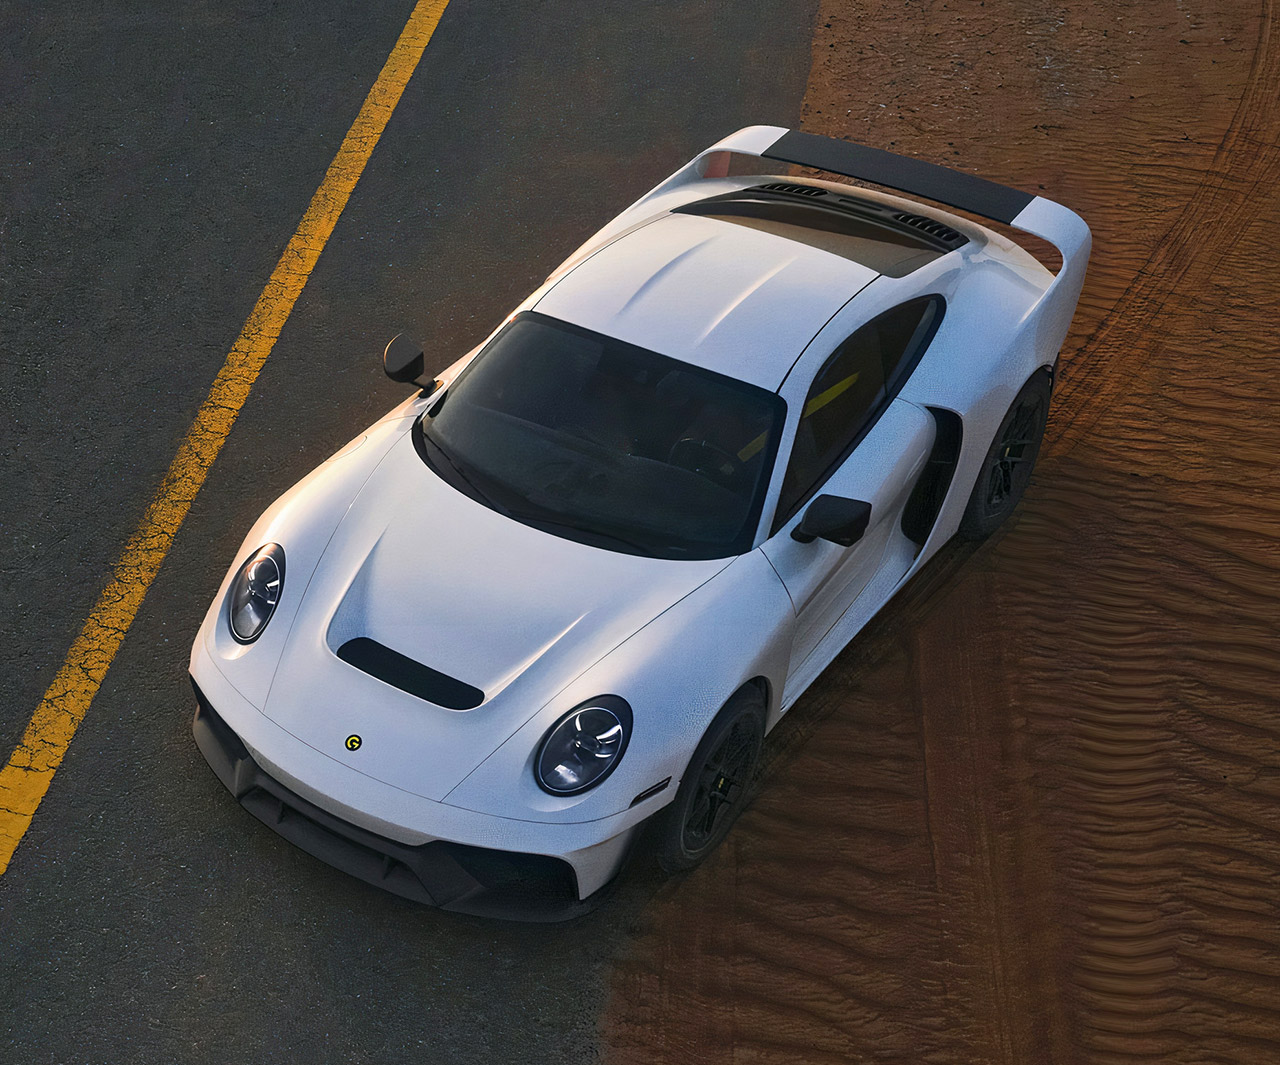 Gemballa Marsien Porsche 911 Off-Road Supercar